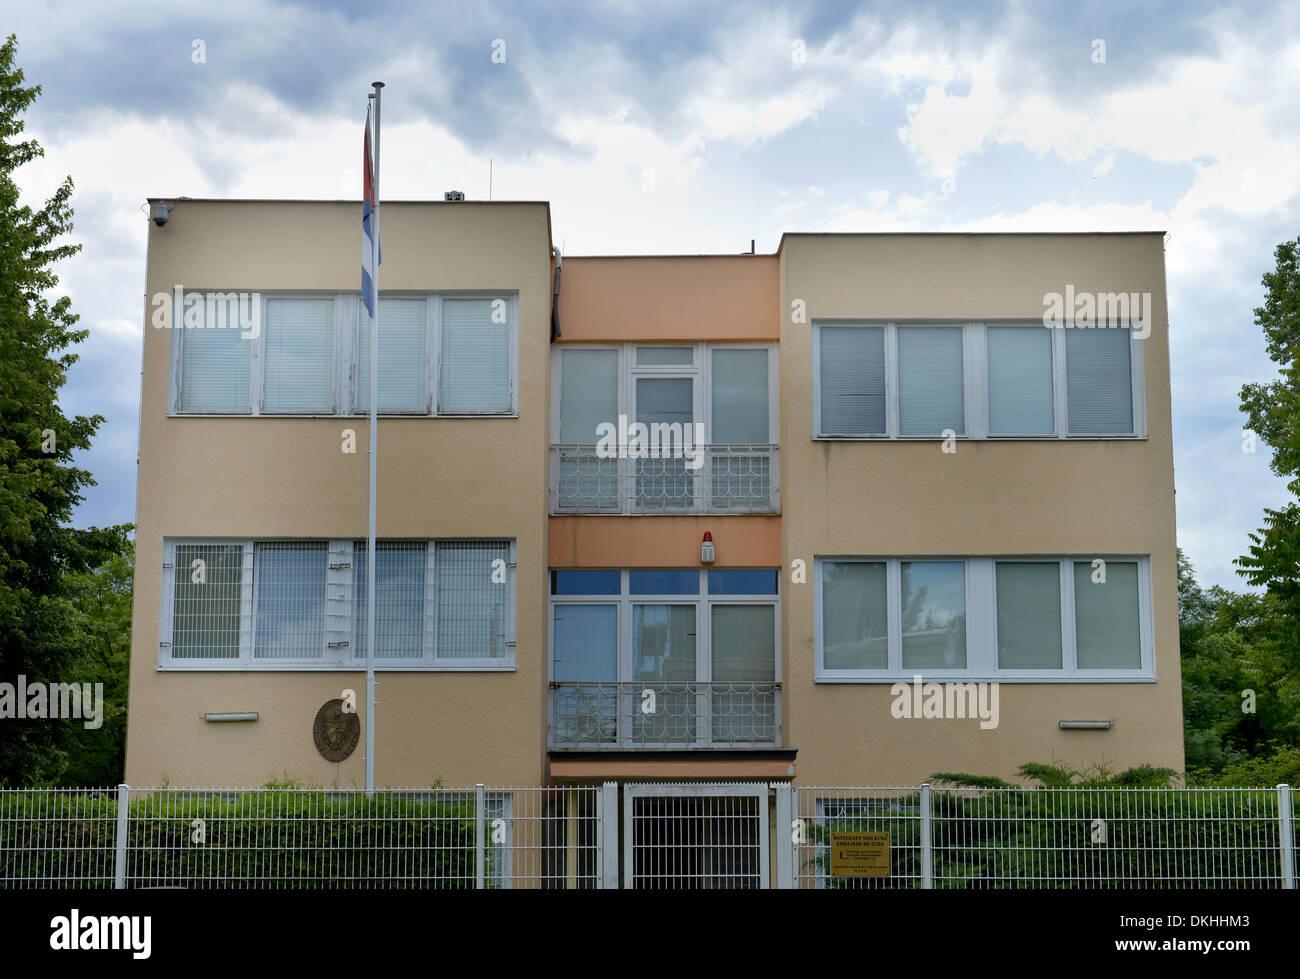 Beschaffenheit der Republik Kuba, Stavangerstrasse, Pankow, Berlin, Deutschland Stockbild